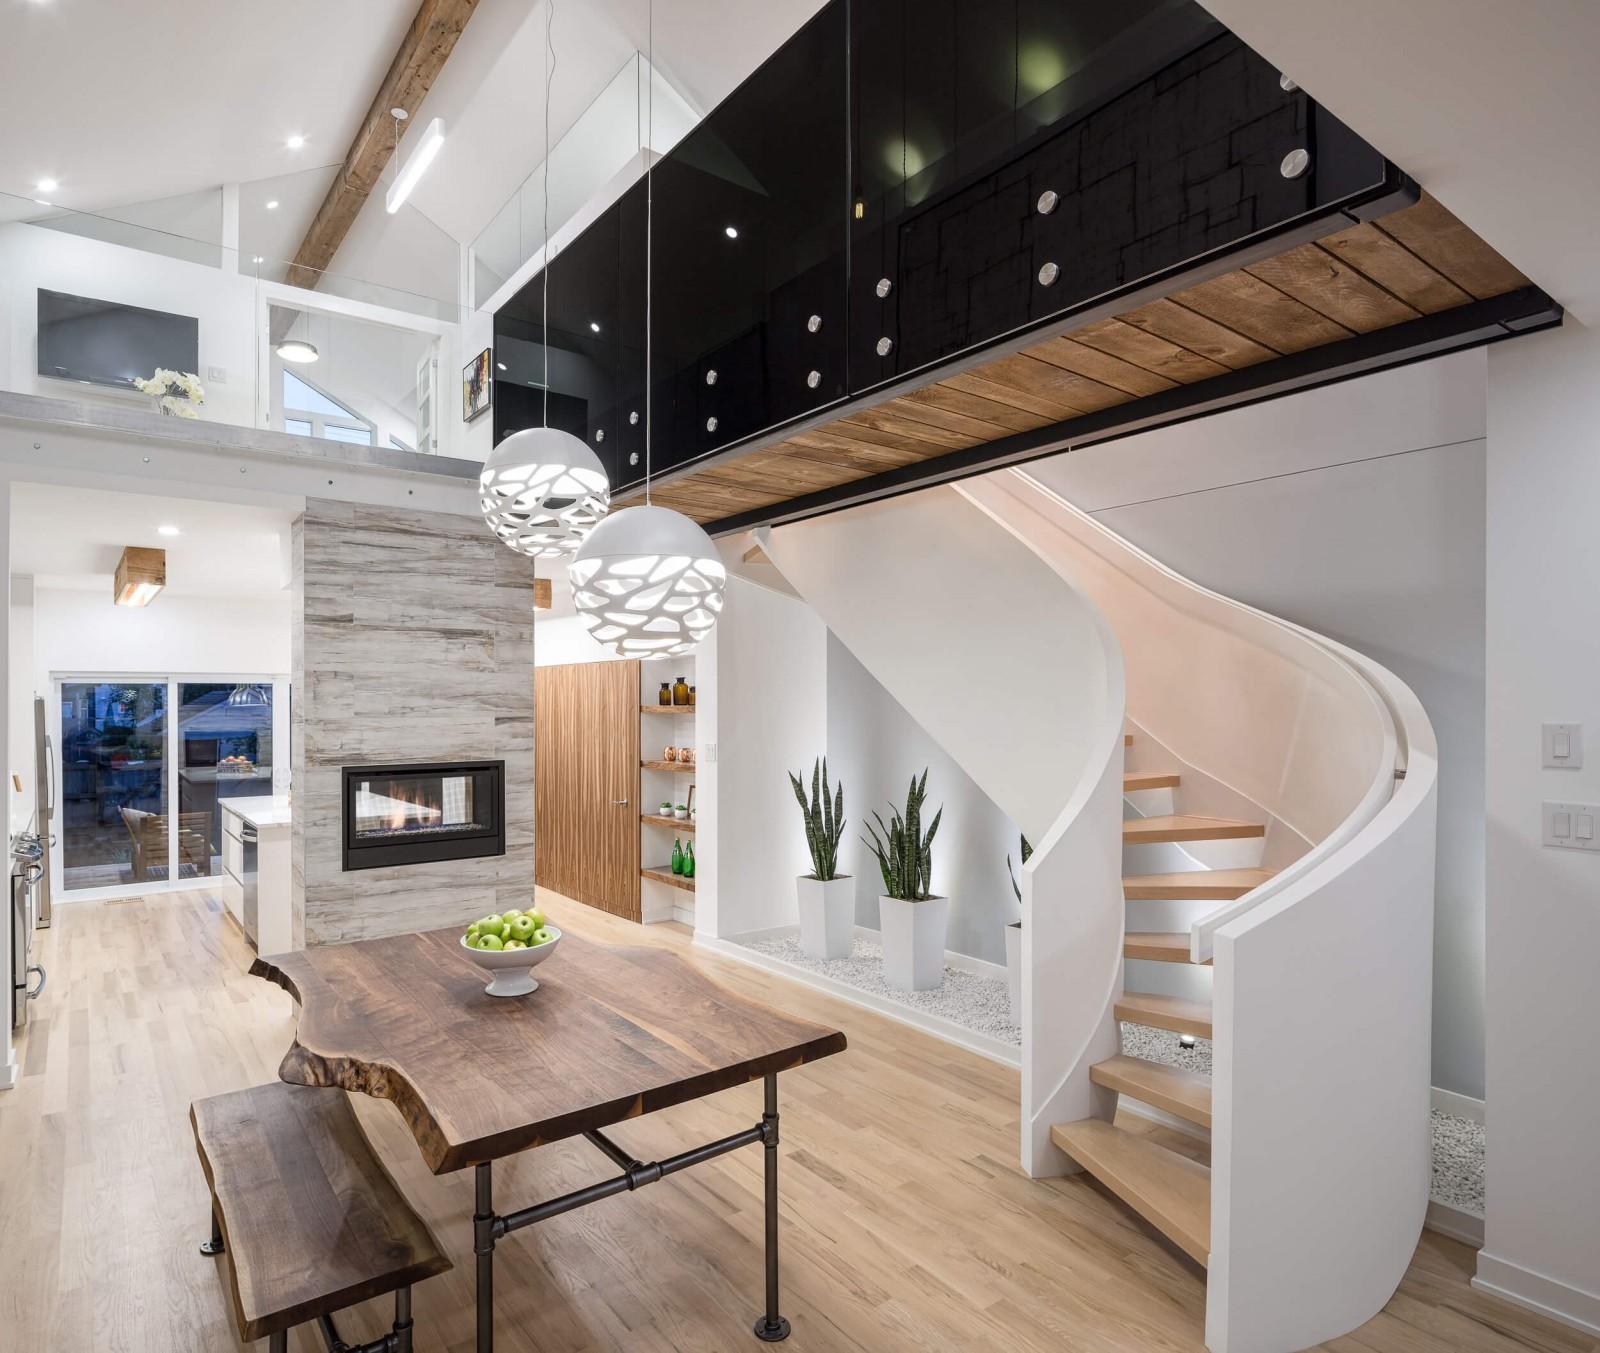 JVLphoto-ArchitecturalDesignPhotographer-Bayswater-Ha2-187-Edit